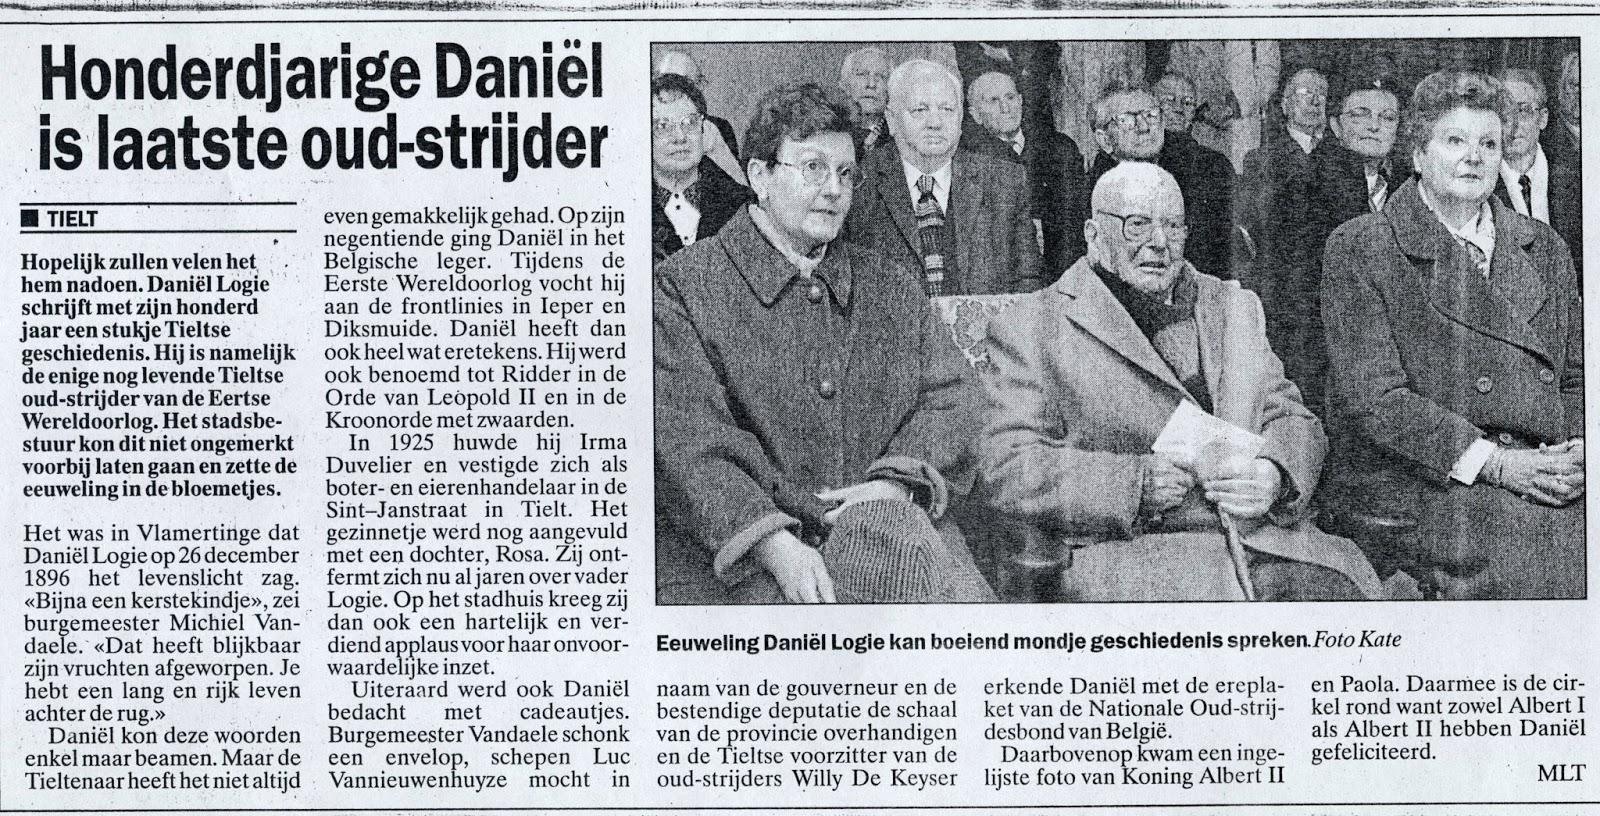 Oud-strijder en vuurkruiser Daniël Logie 1896-1997, als honderdjarige gevierd. Onbekend krantenartikel.